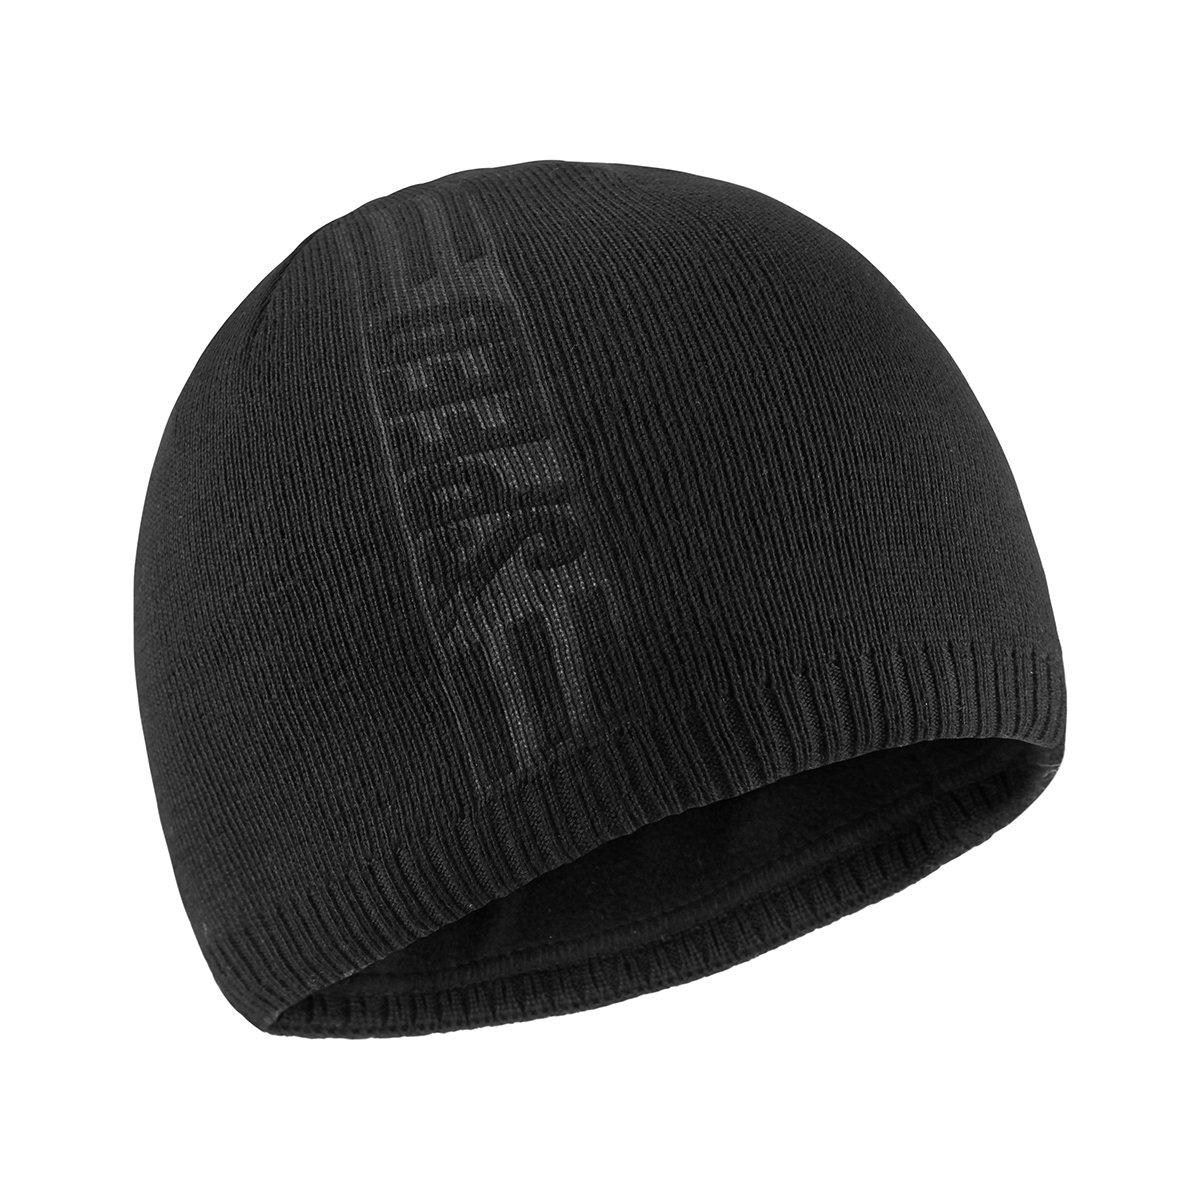 8936ebebf Bodvera Mens Winter Warm Knit Beanie Hats Tactical Fleece Plain Toboggan  Ski Skull Cap 3 Colors